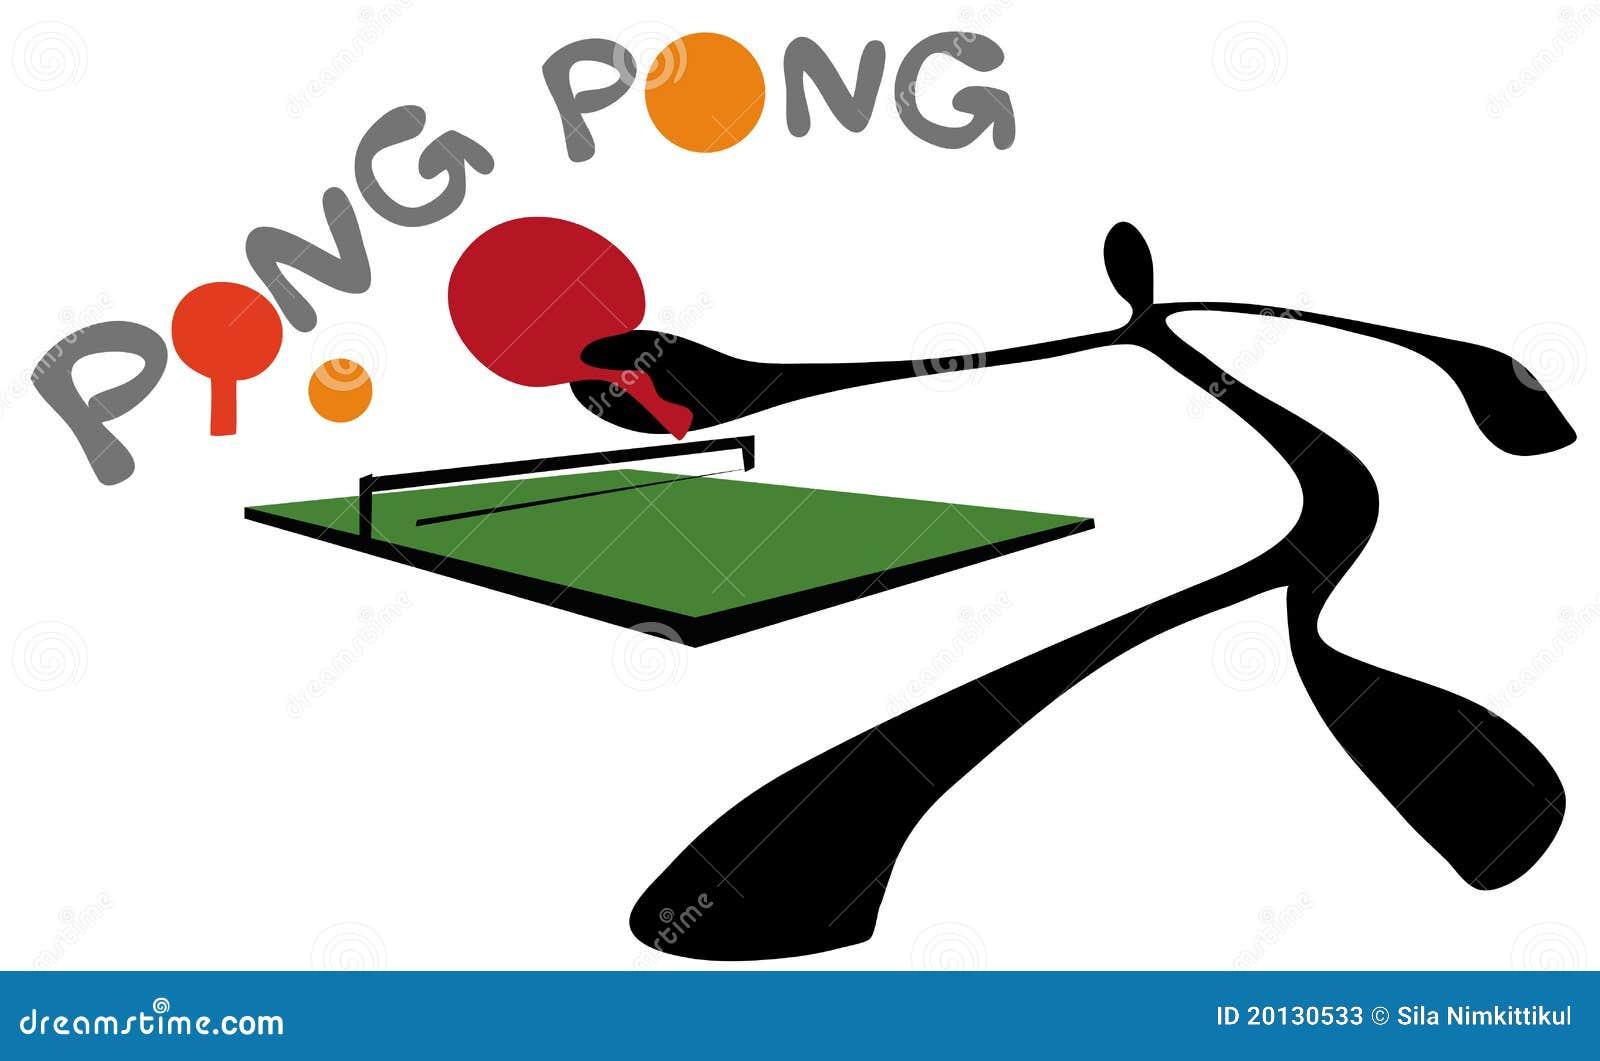 Shadow Man Ping Pong Or Table Tennis Stock Photos - Image: 20130533